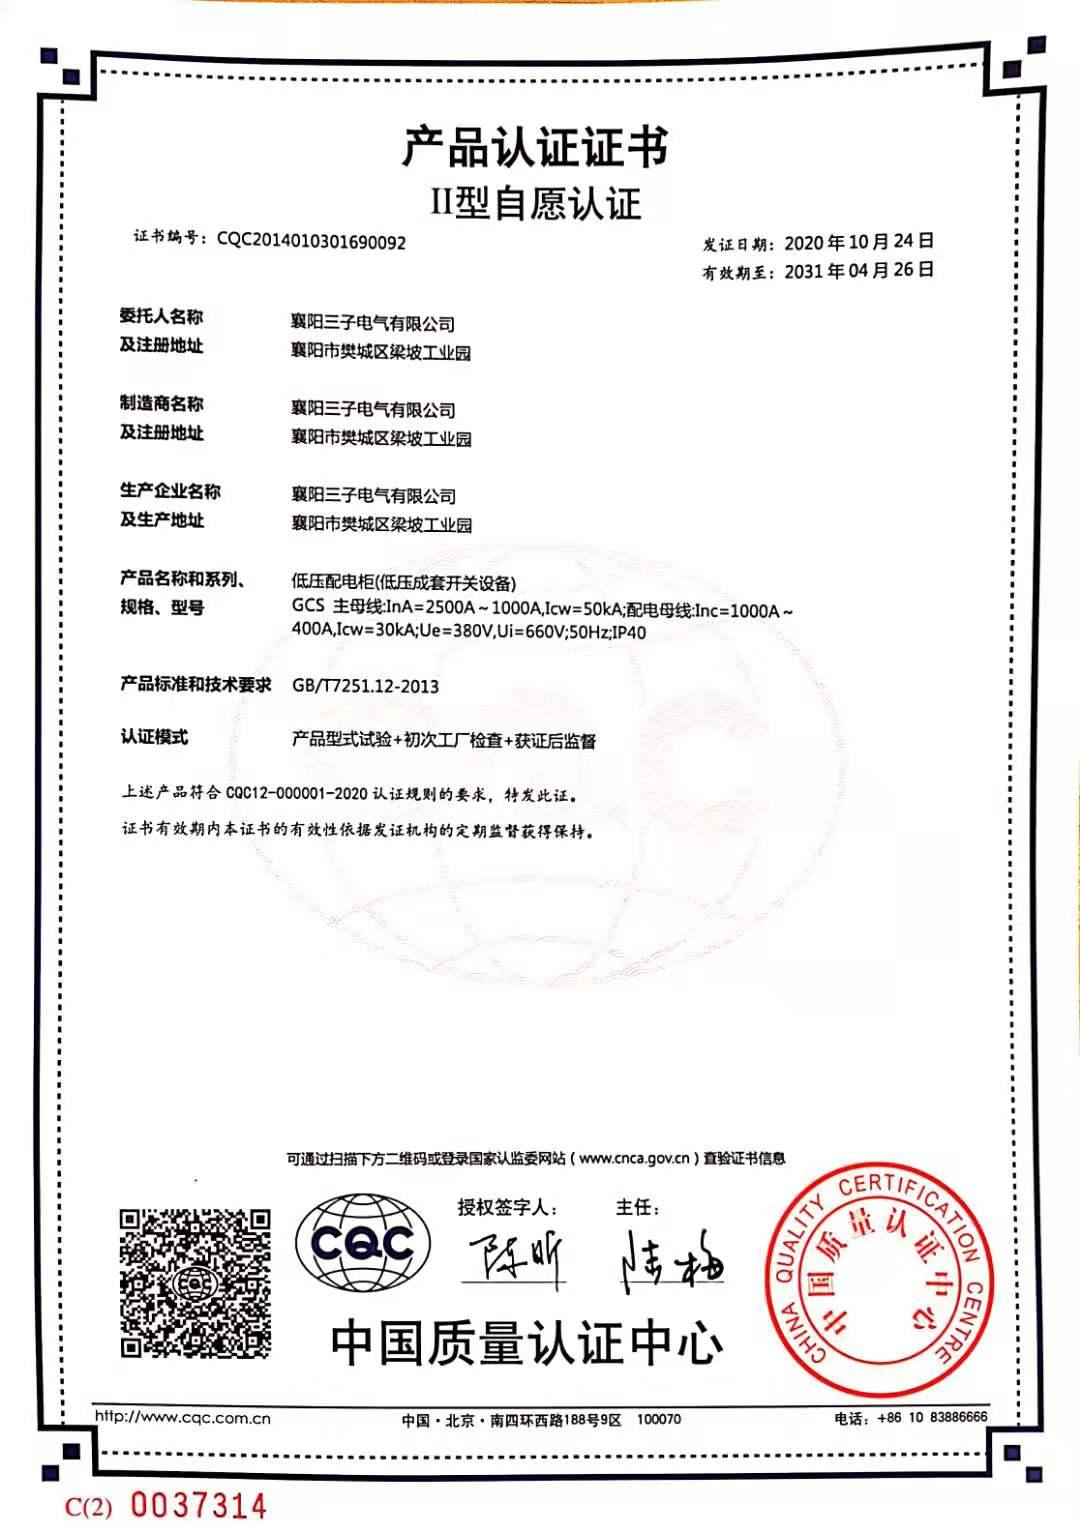 APP体育产品认证证书